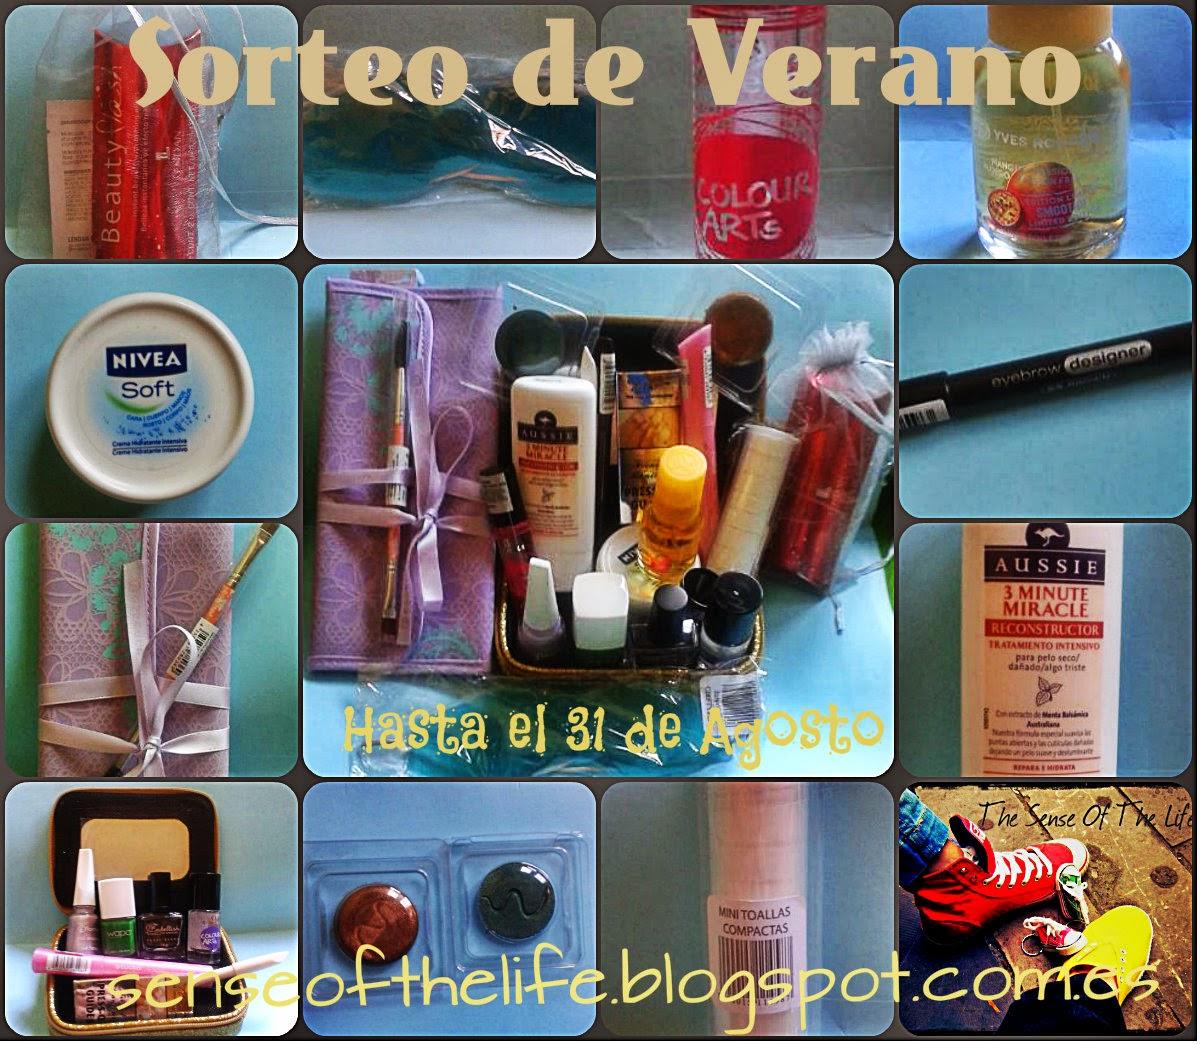 Sorteo the sense of the life